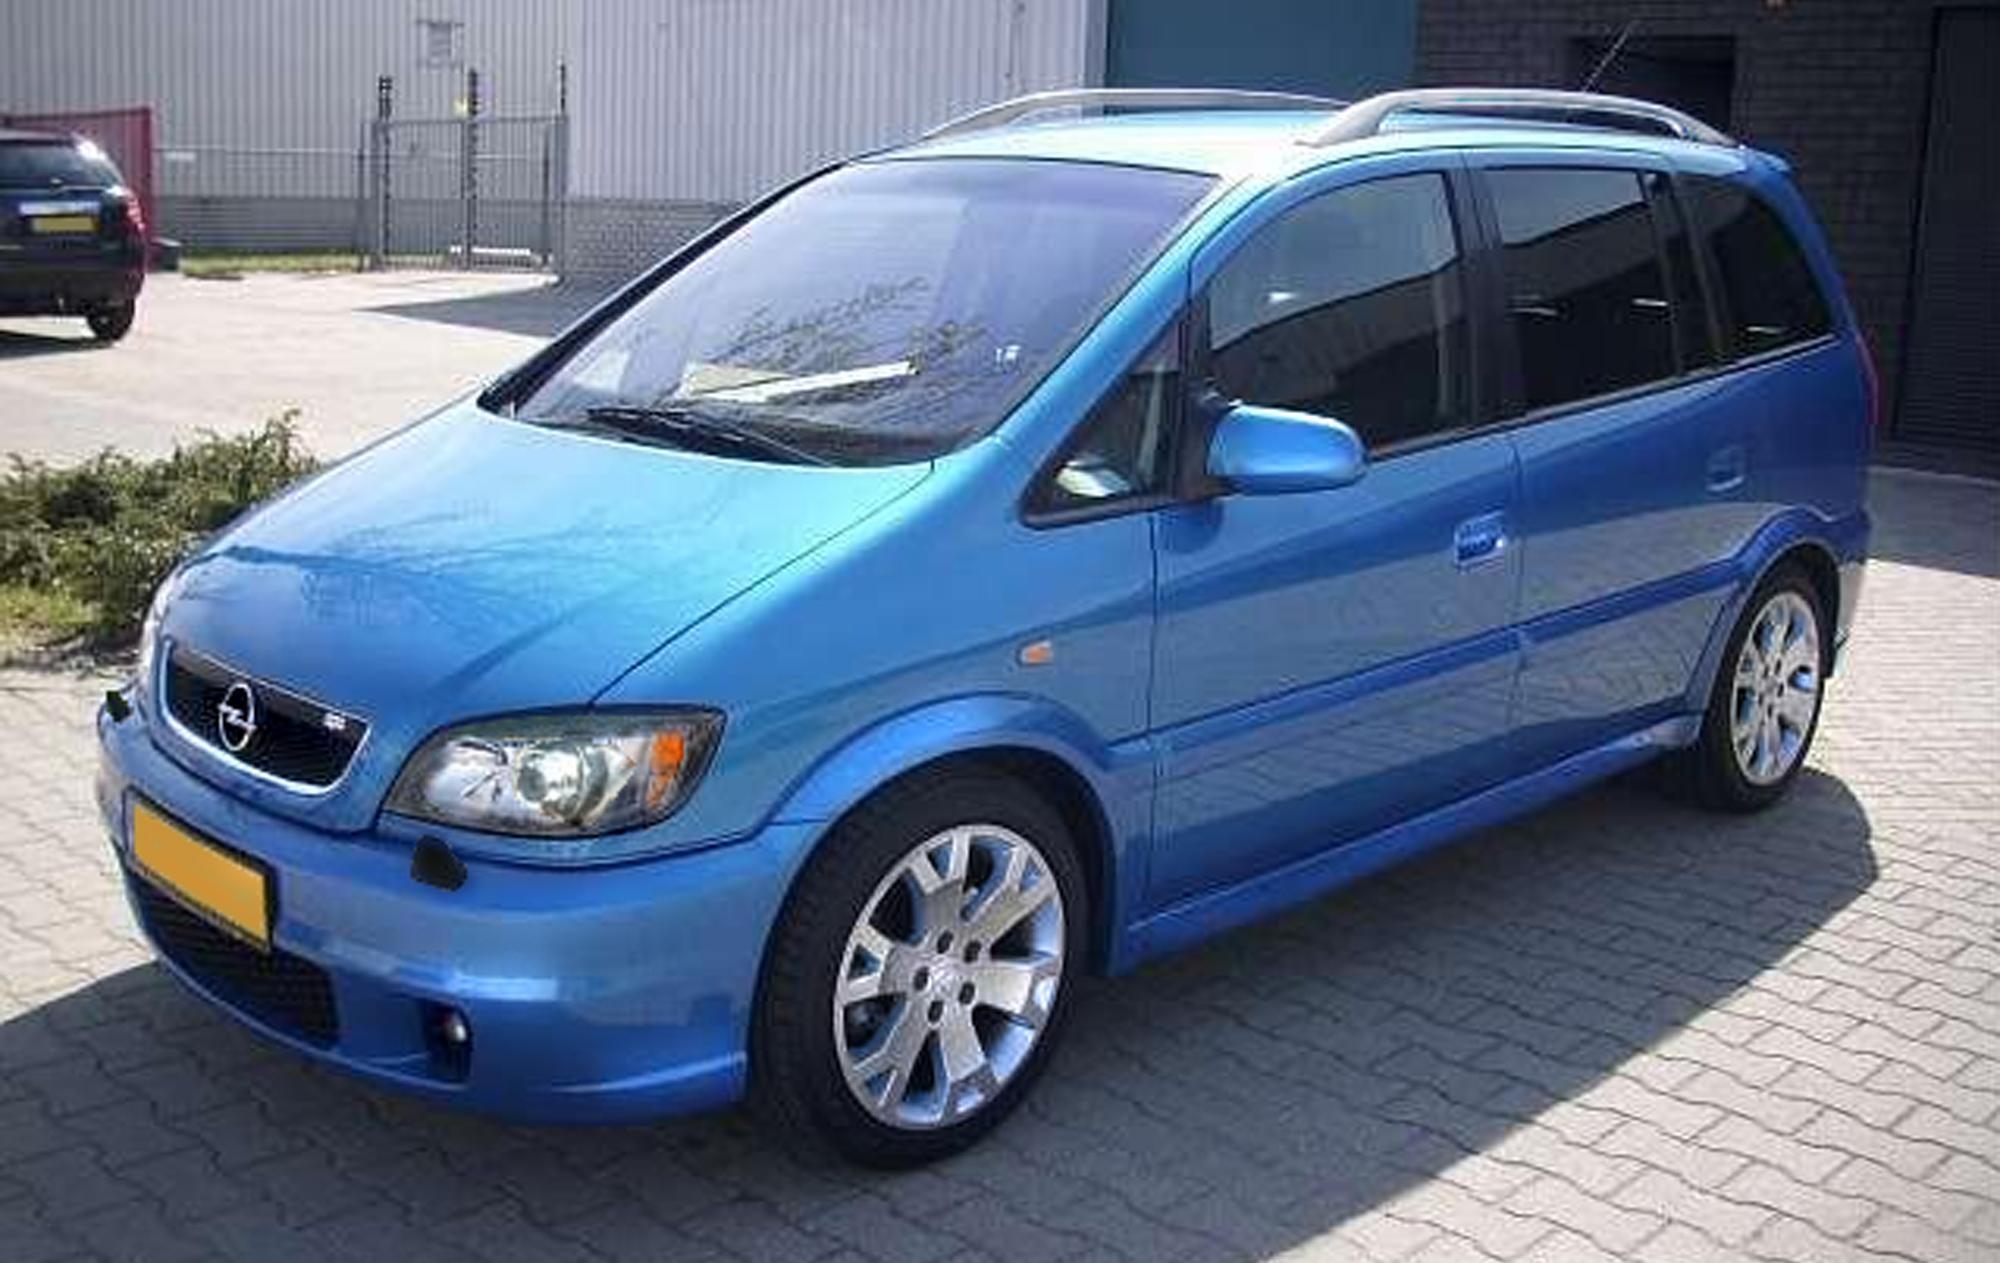 Opel Zafira OPC A 2001 - 2003 Compact MPV #3